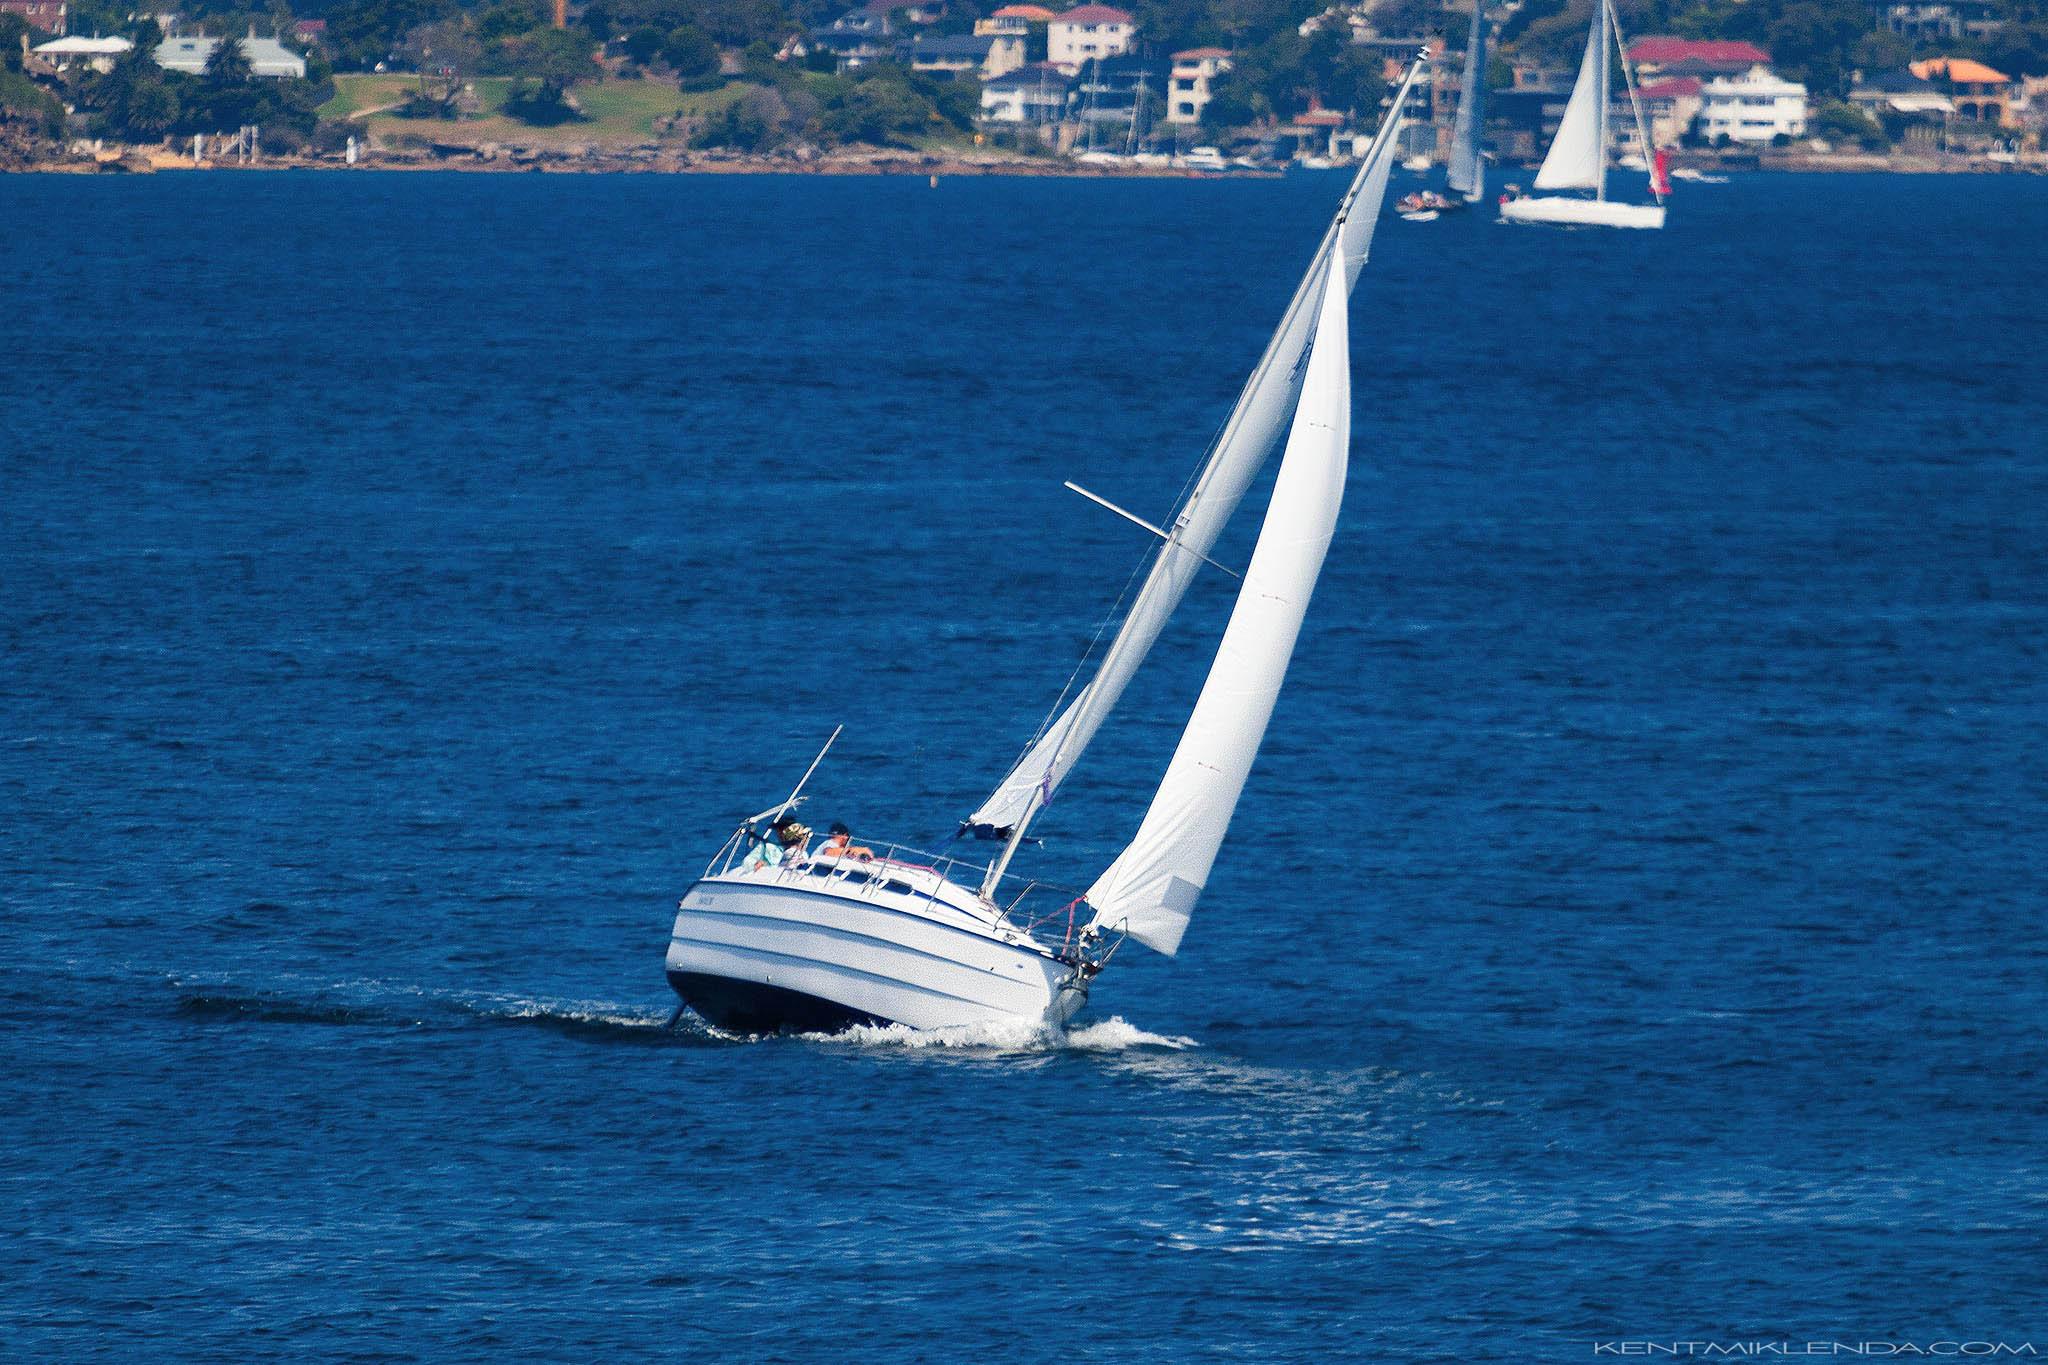 Imexus-28-in-Middle-Harbour-1-2048x1365-KM.jpg